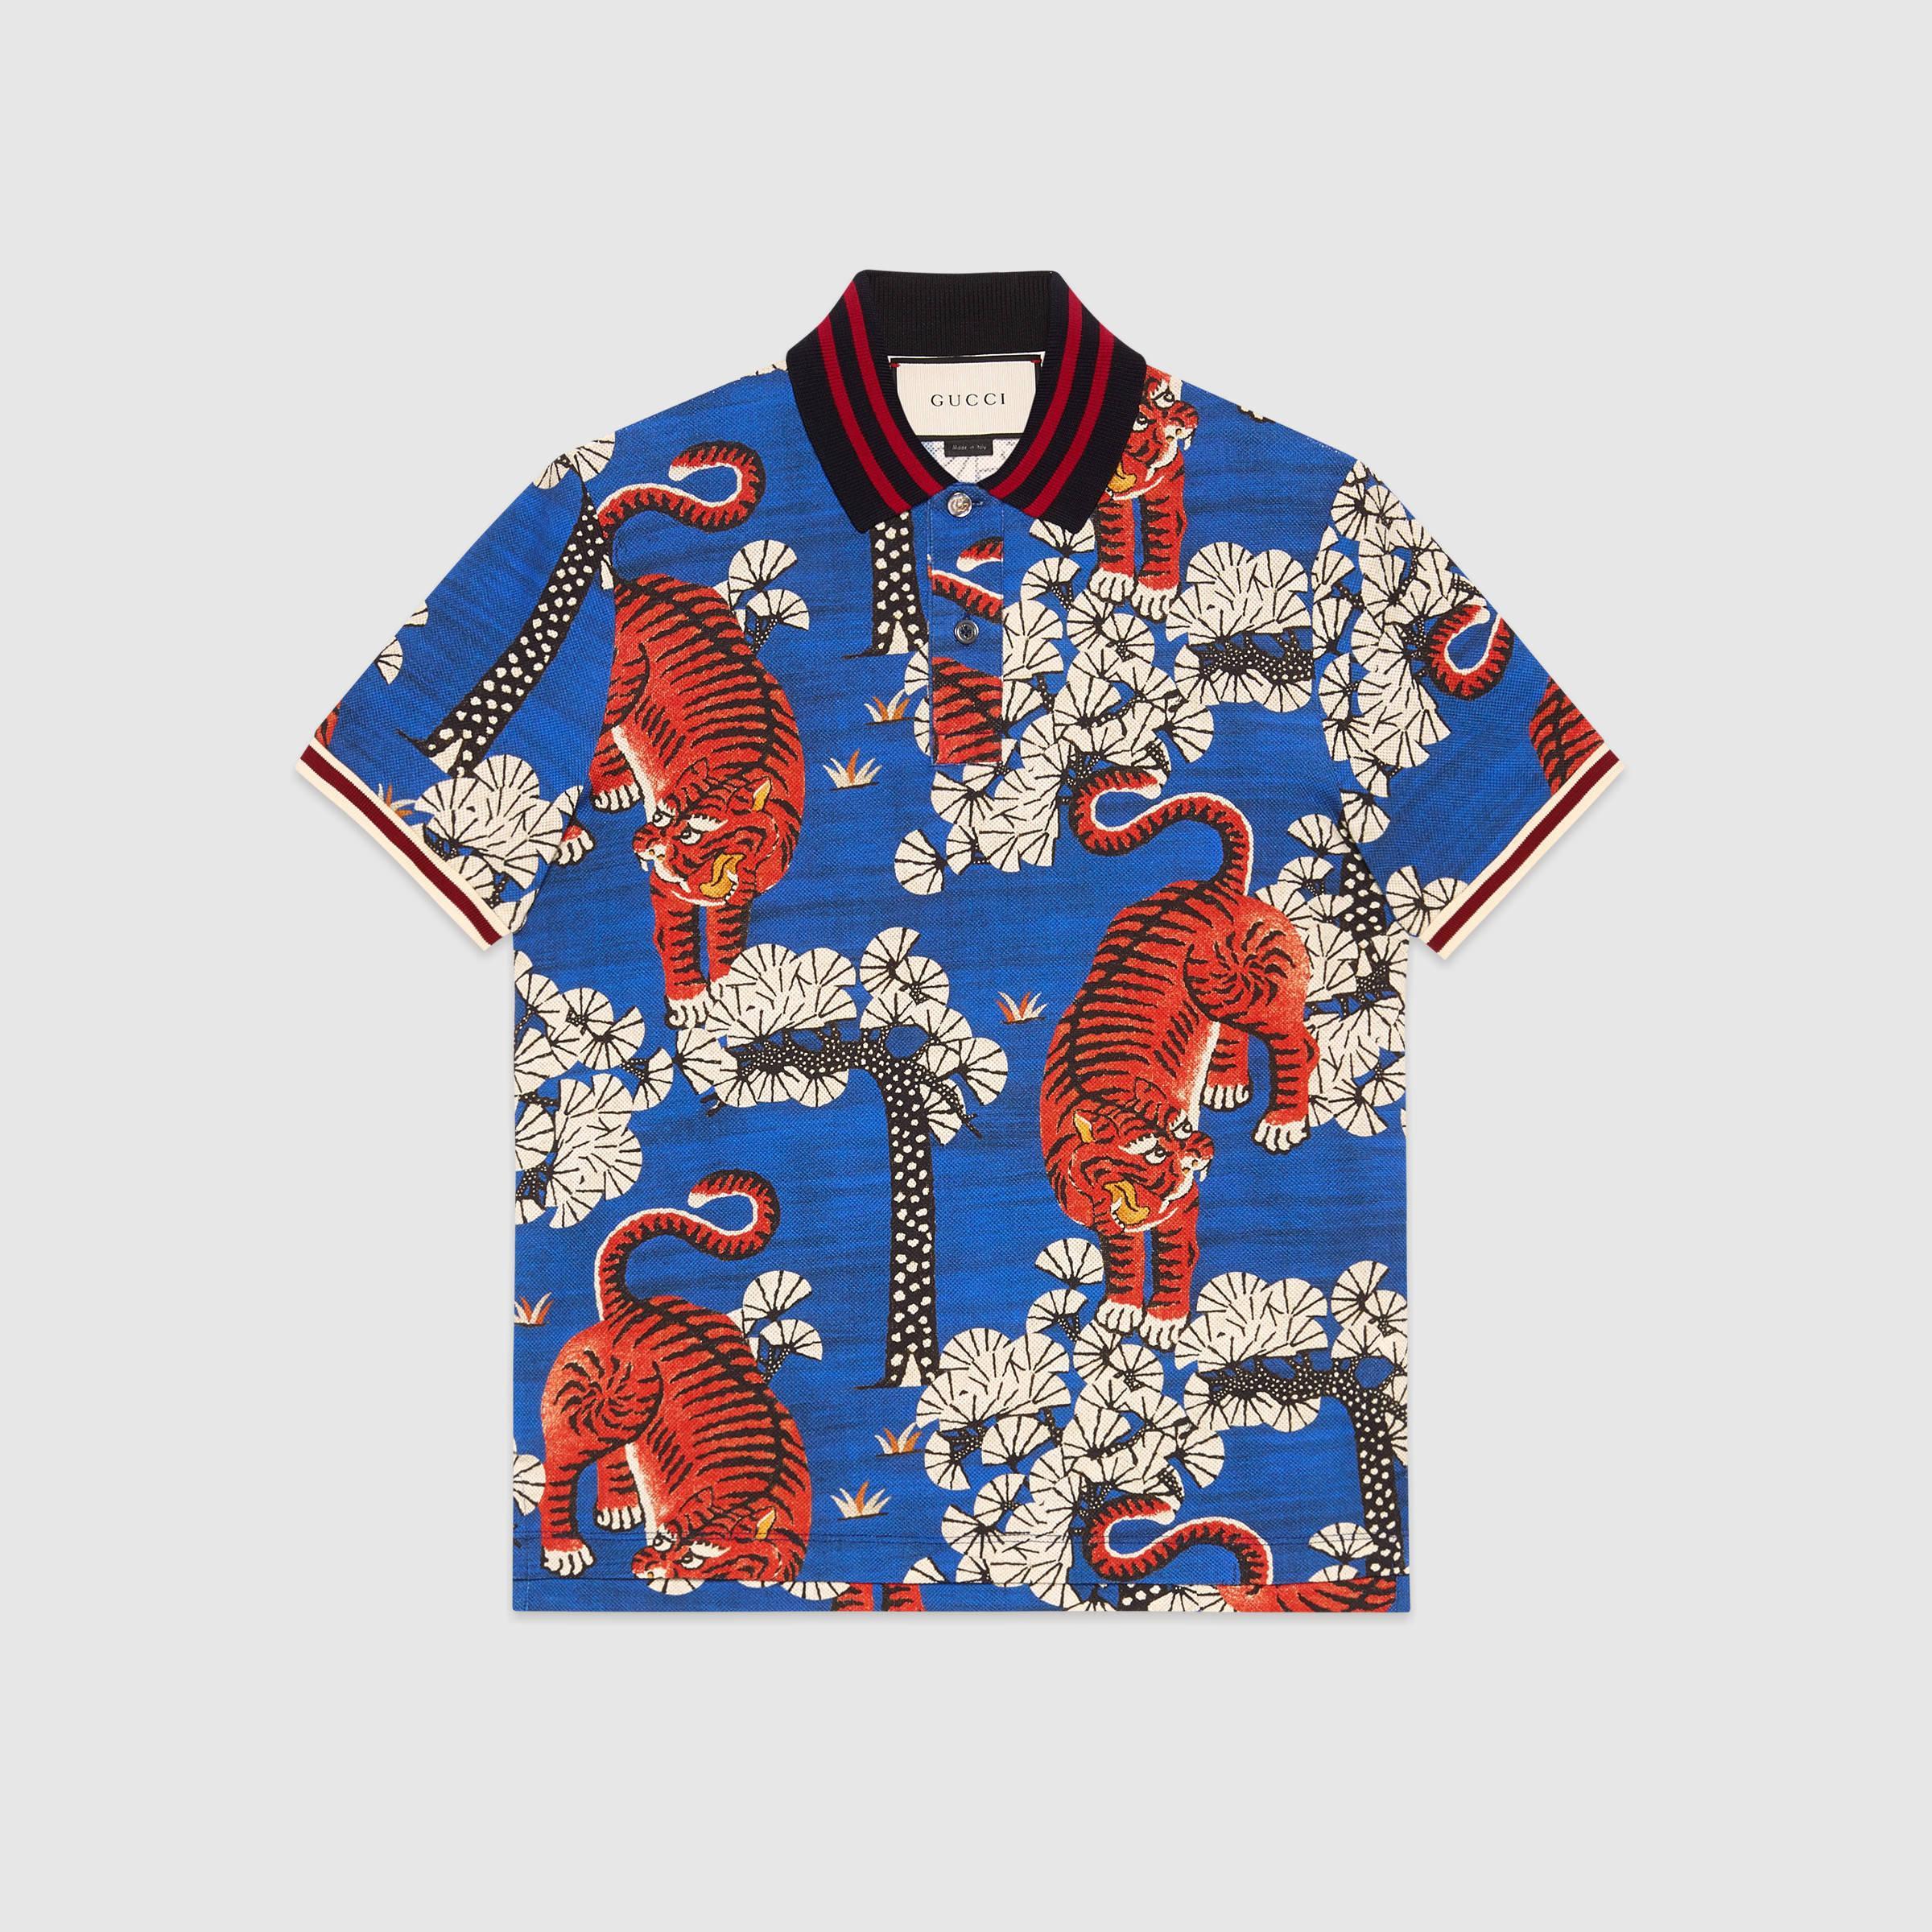 Prada Shirts For Men